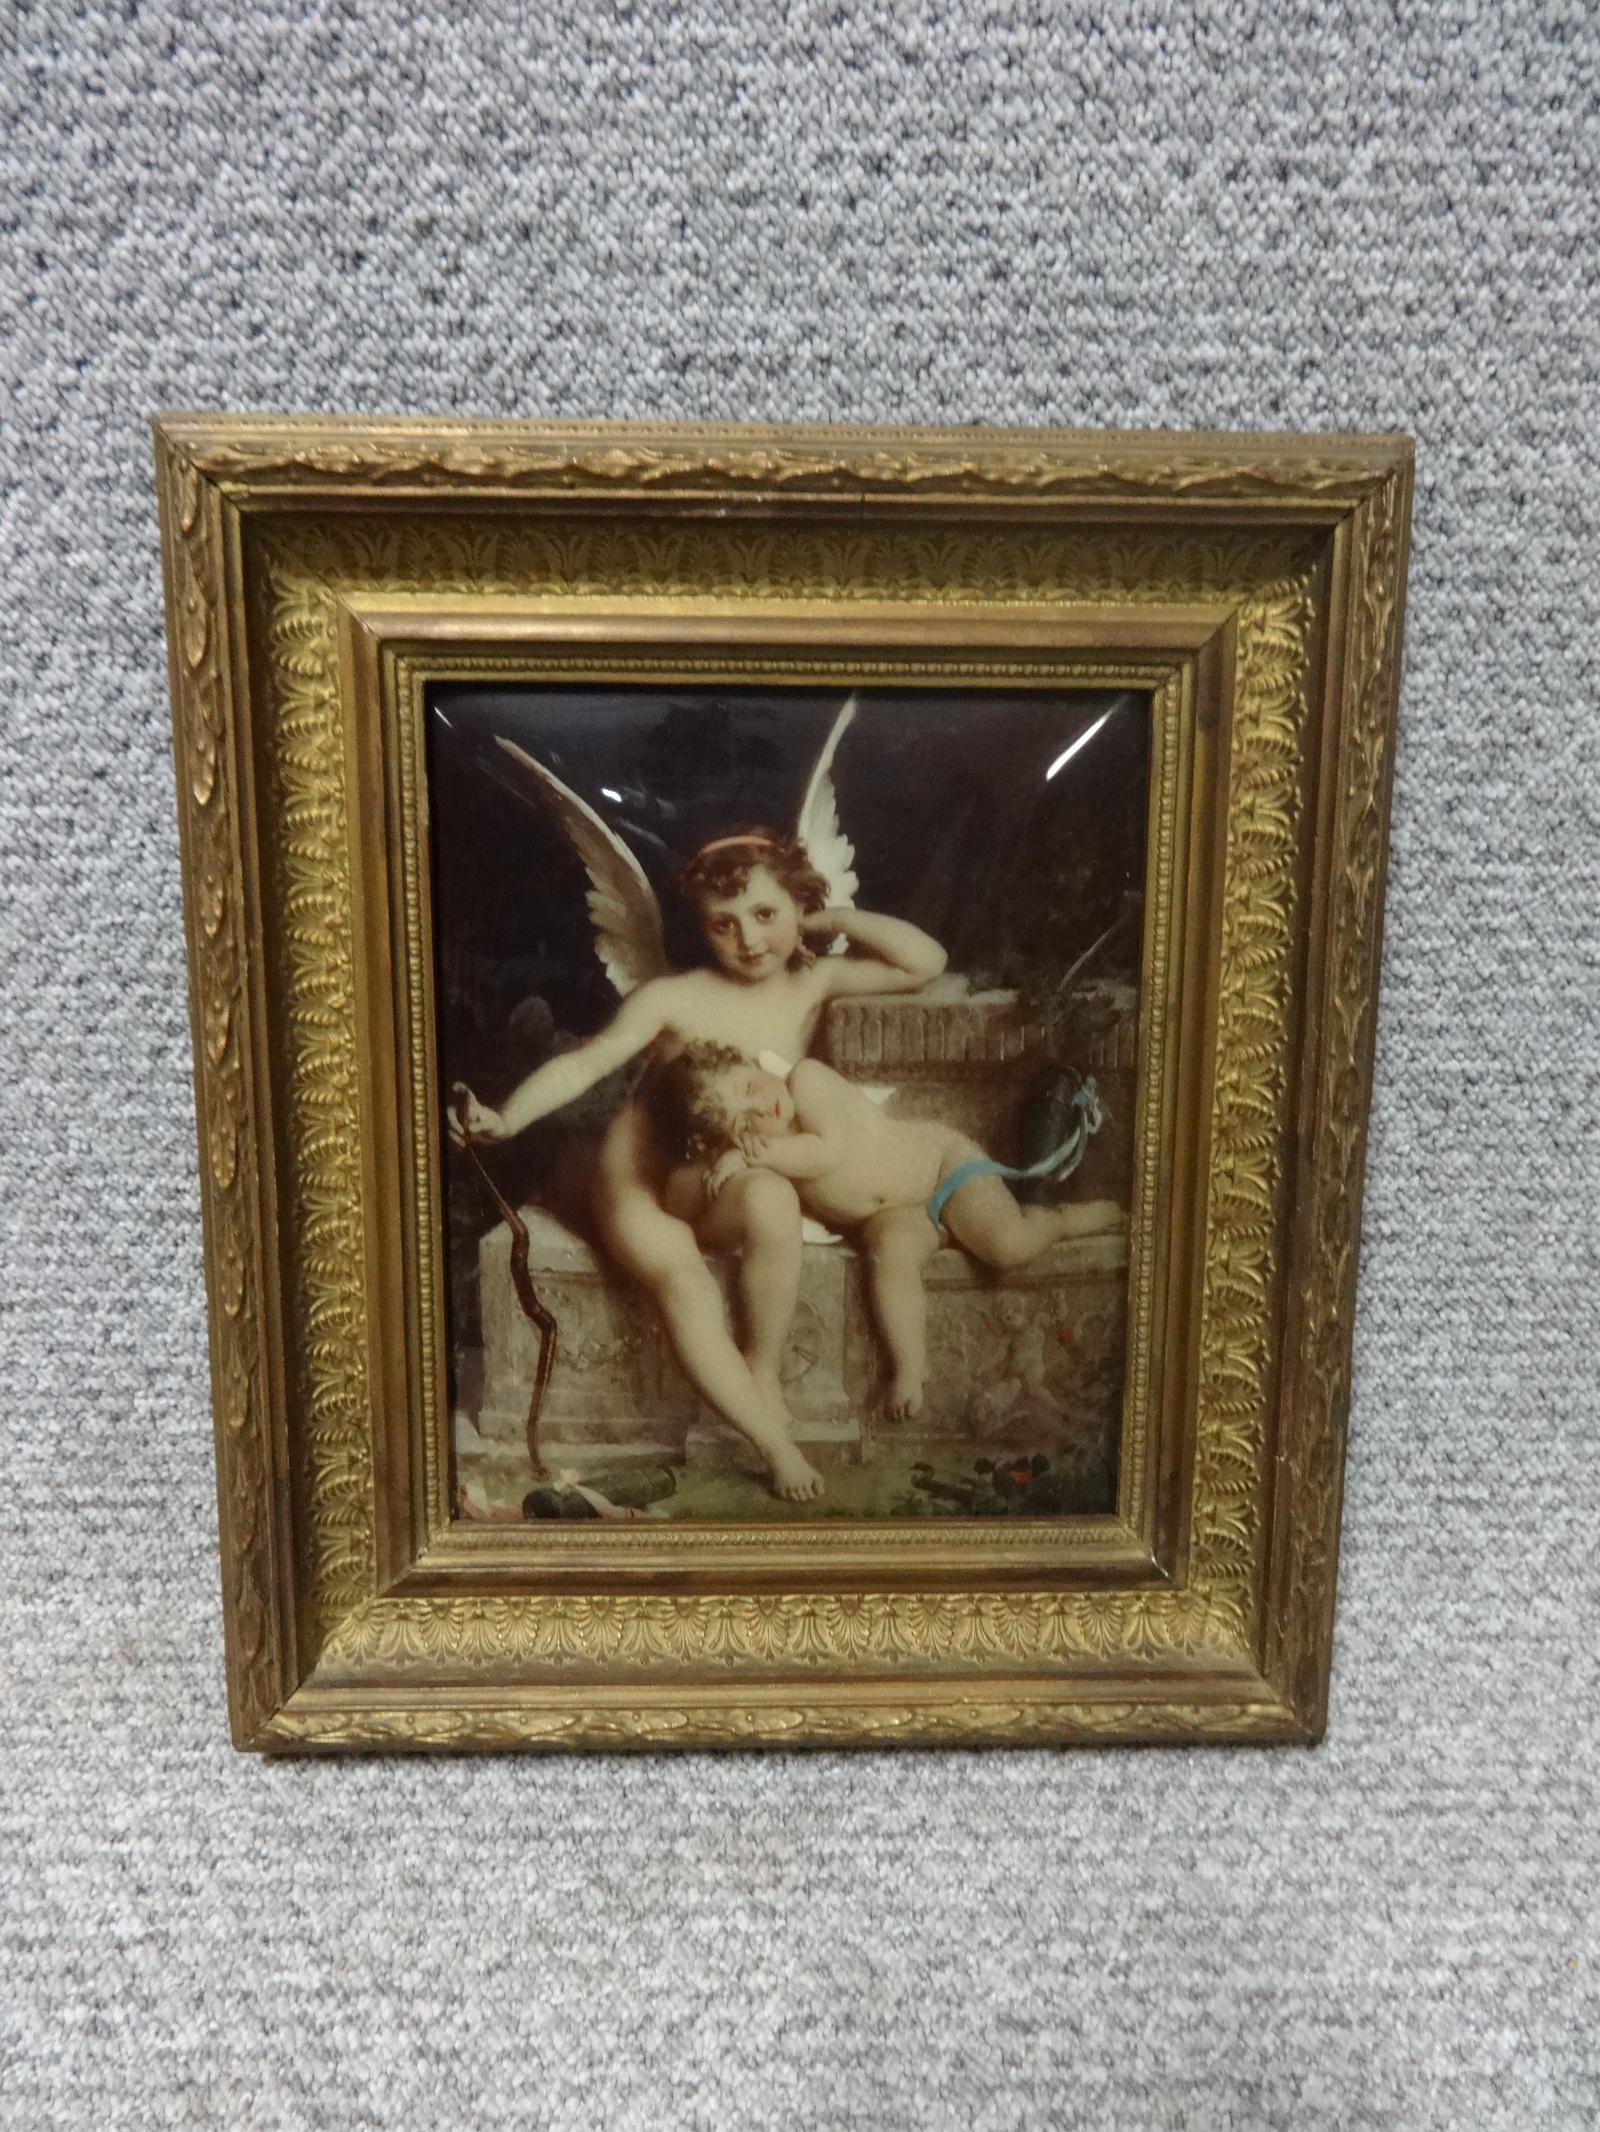 Outstanding Chrystoleum of Cupid and Sleeping Cherub (1 of 1)